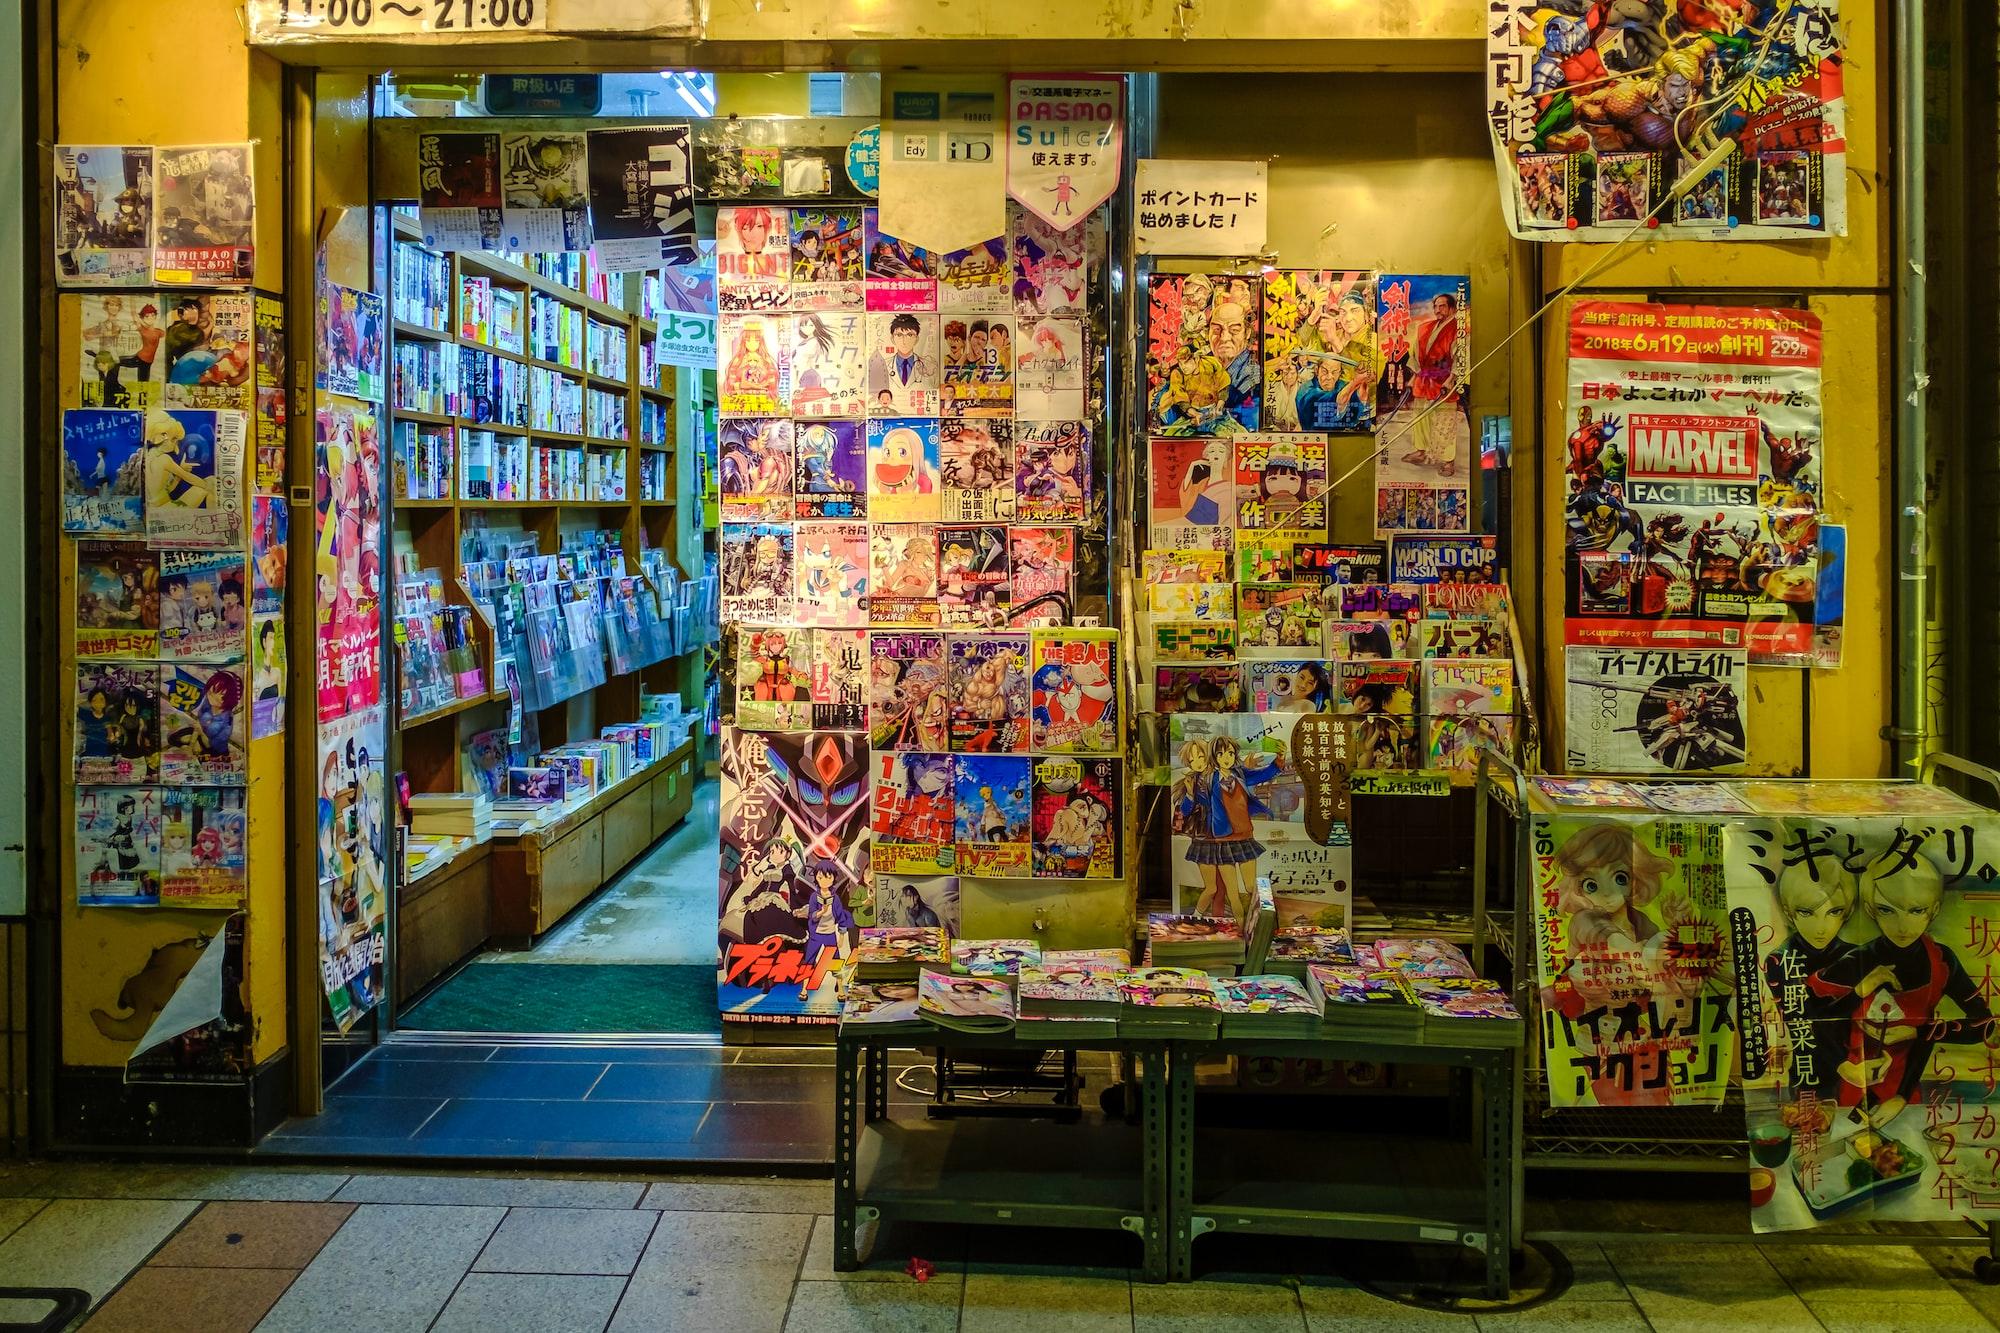 Les scan-trad manga...